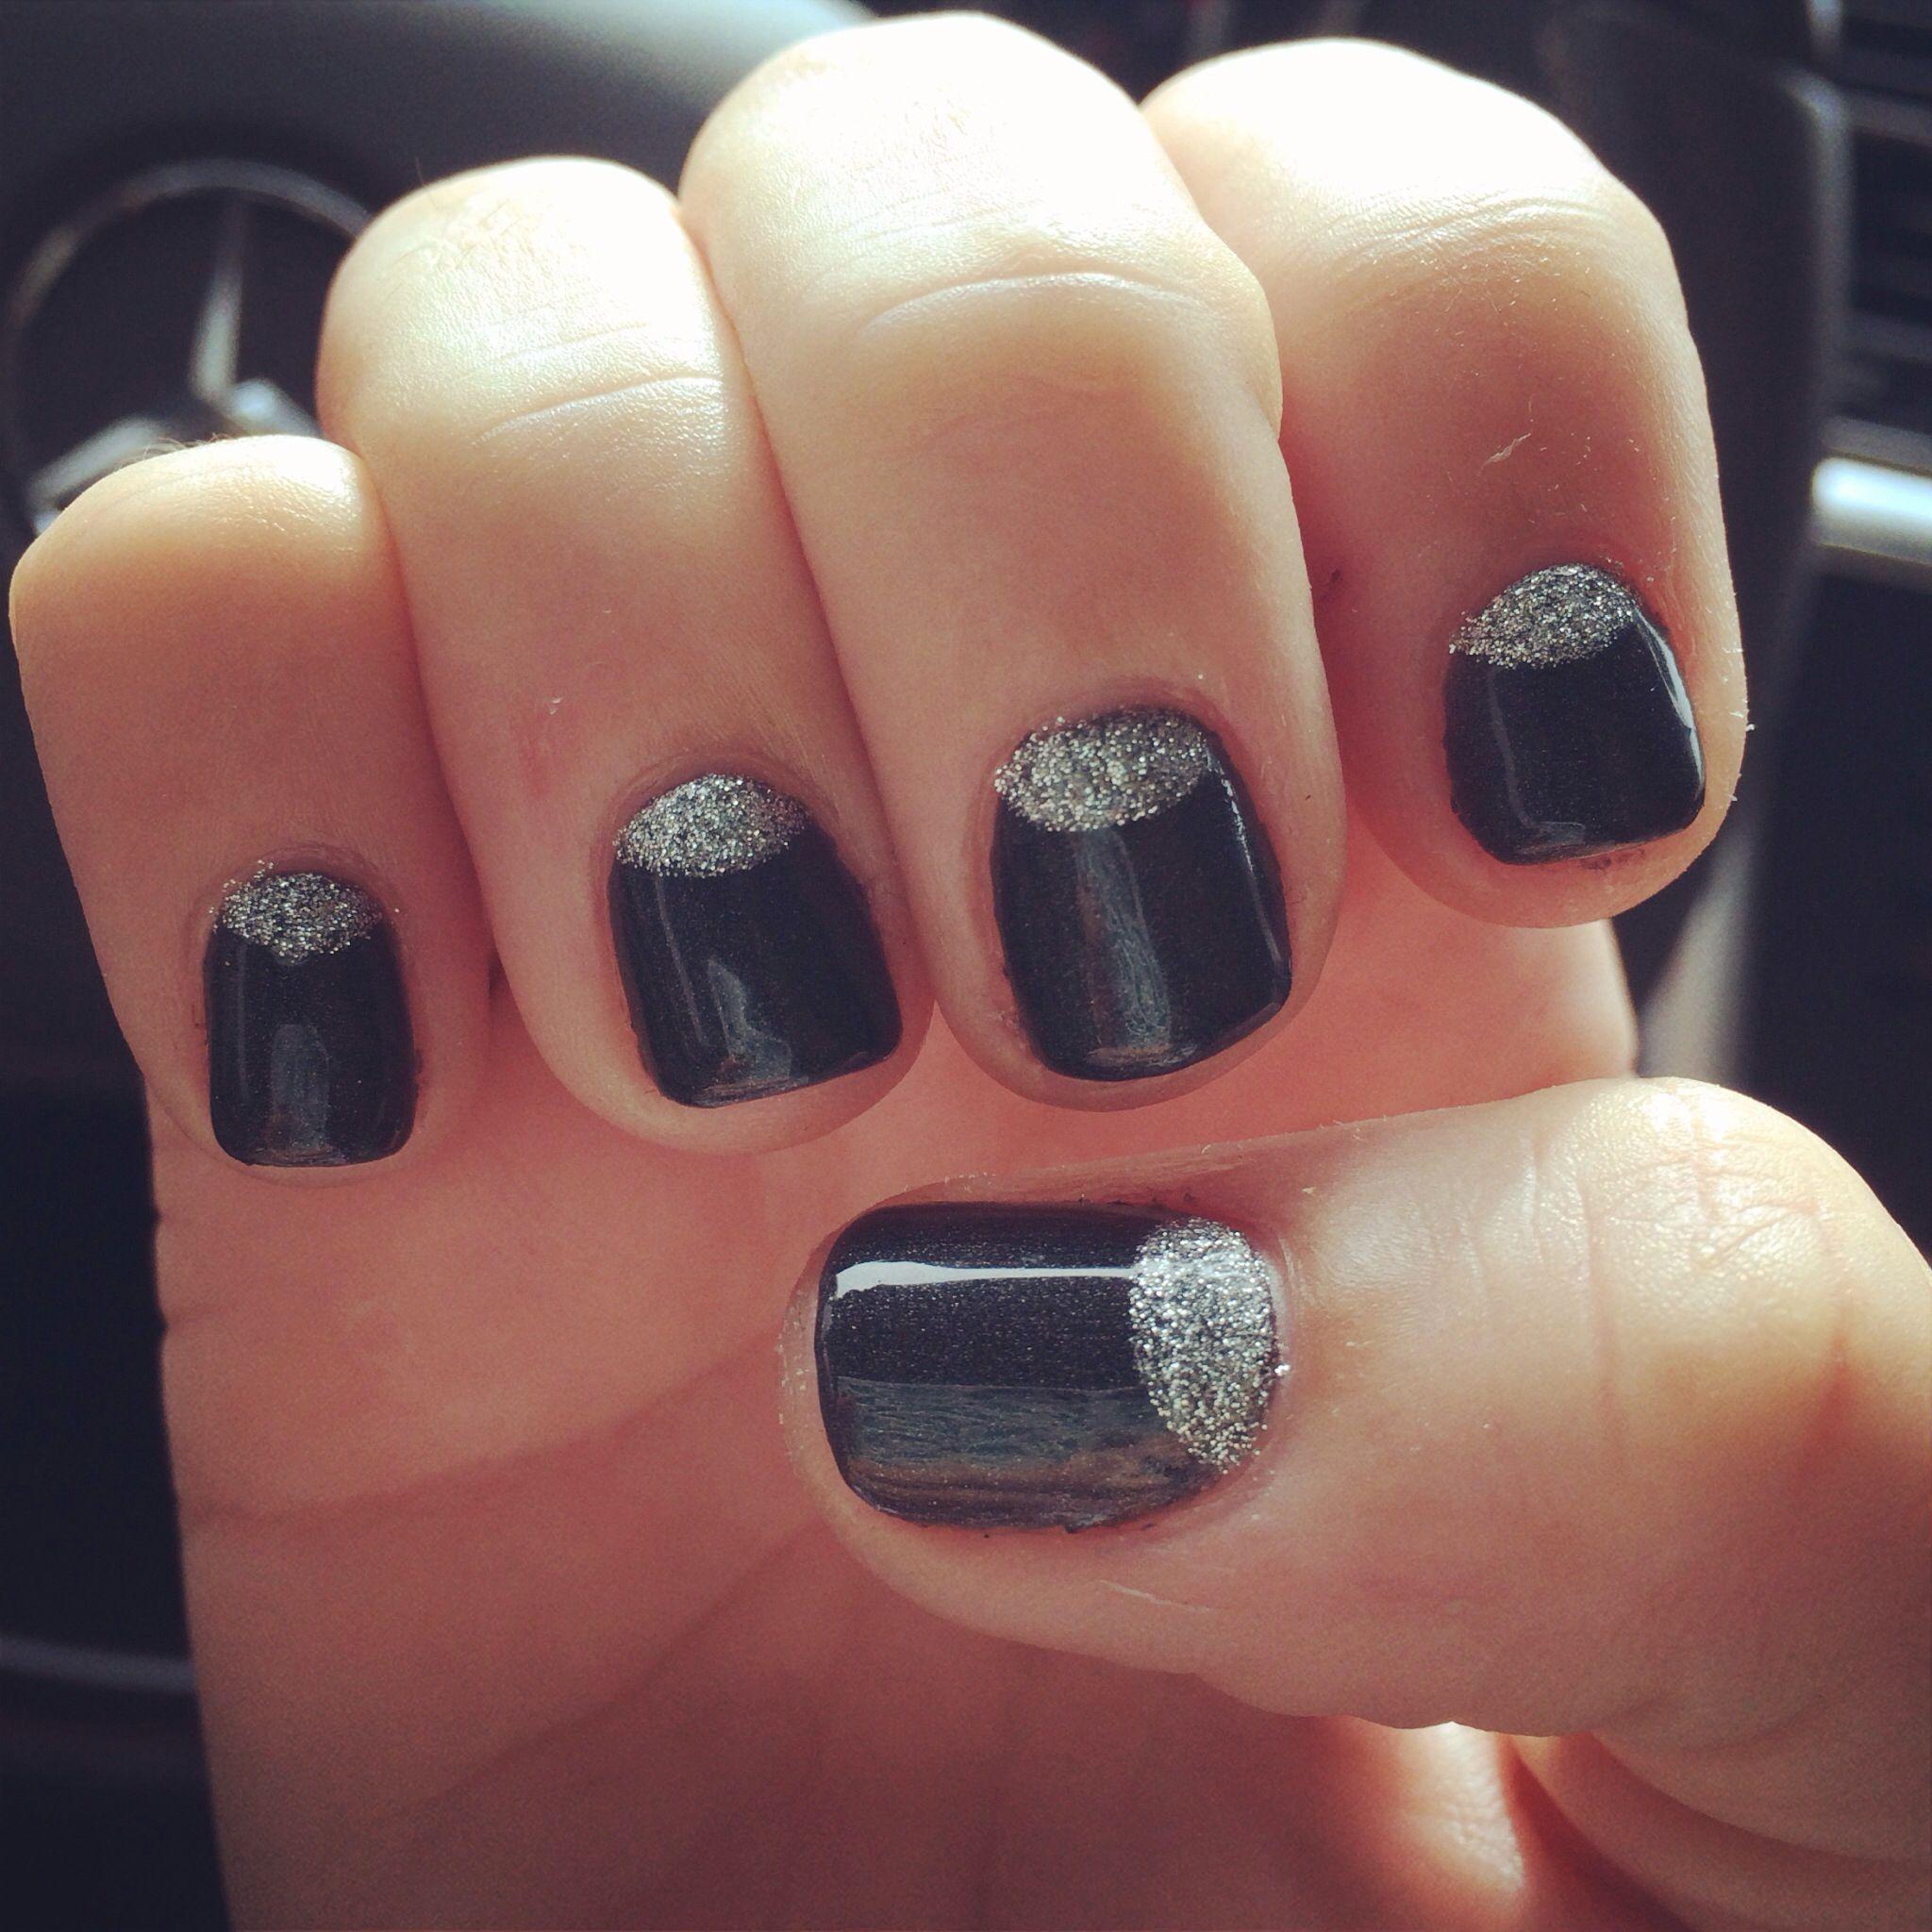 New Years Nails- black and glitter gelish nail art design   Nails ...